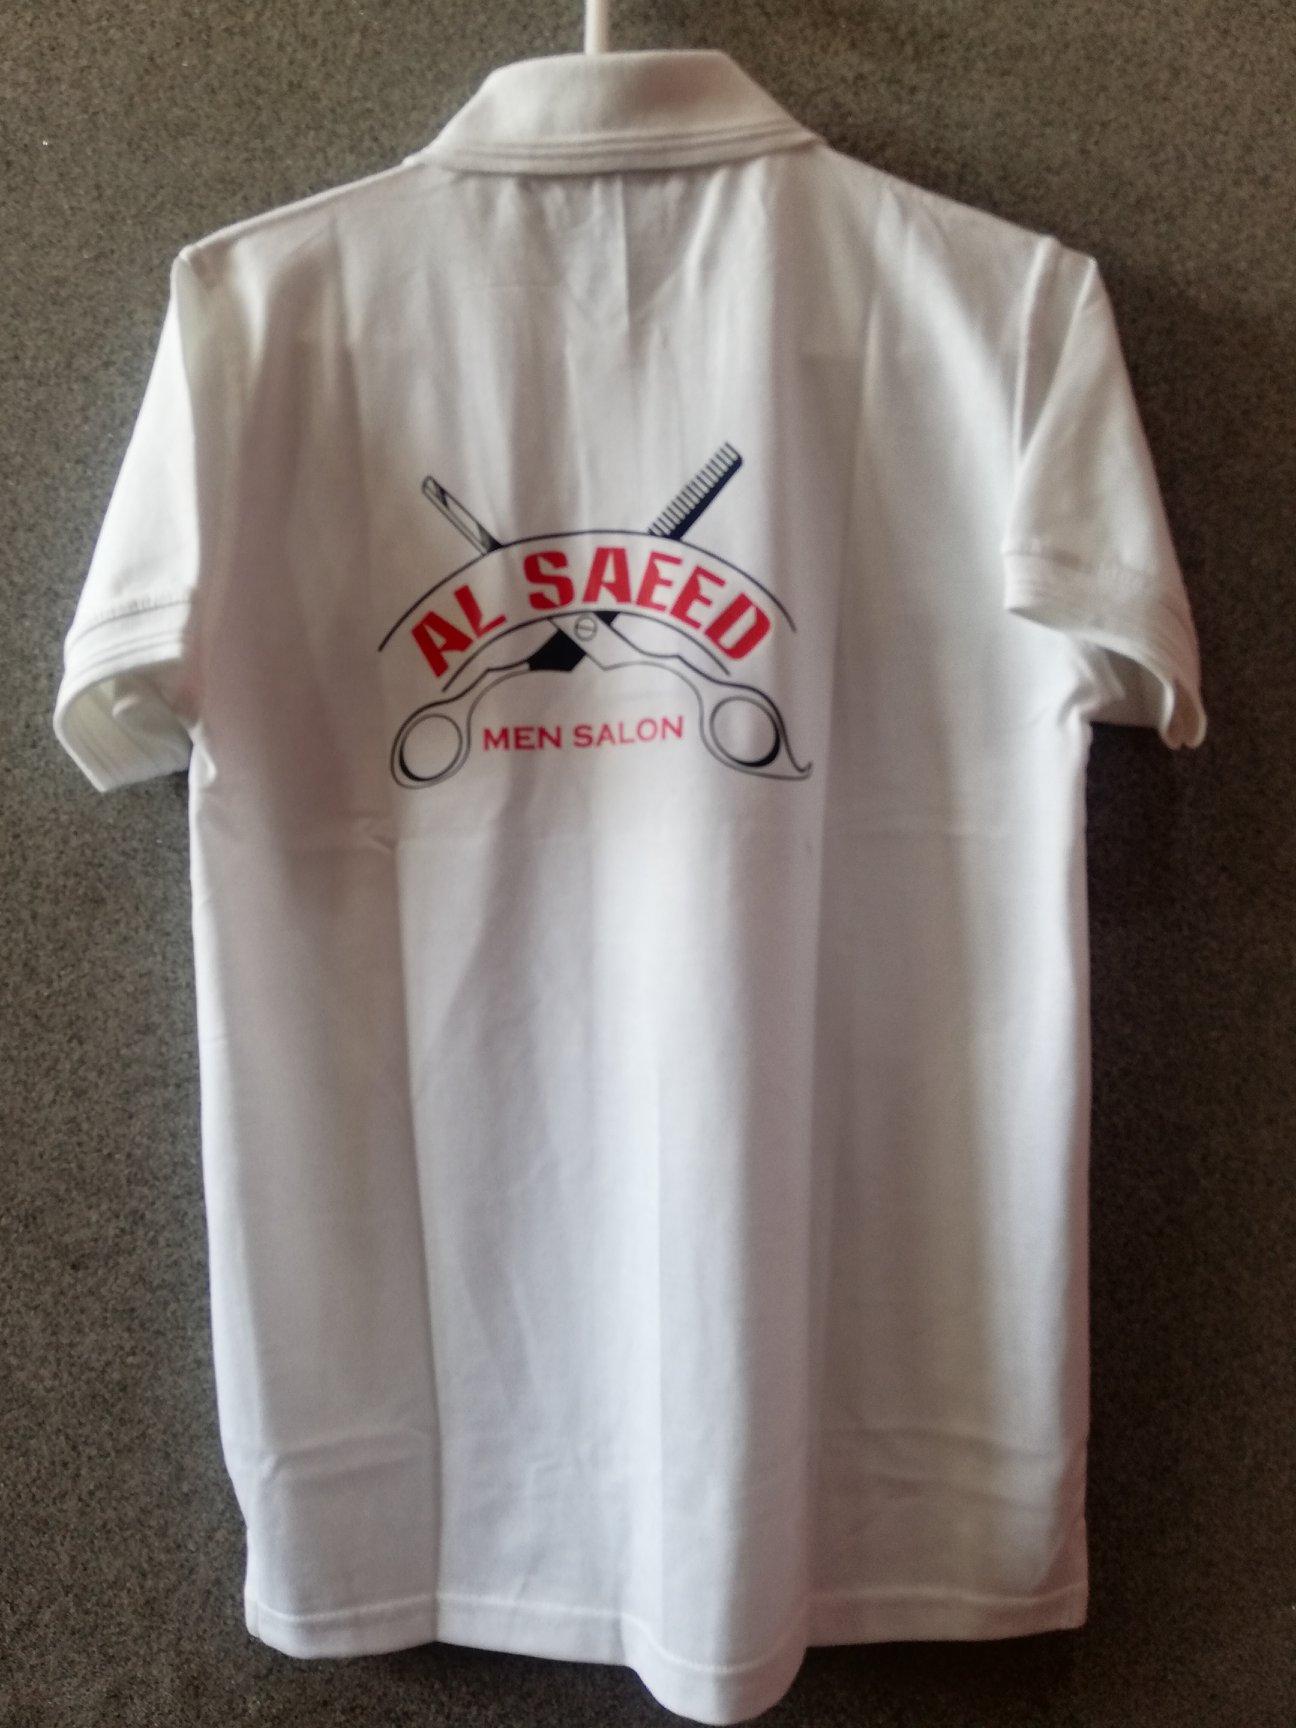 T shirt printing in Islamabad